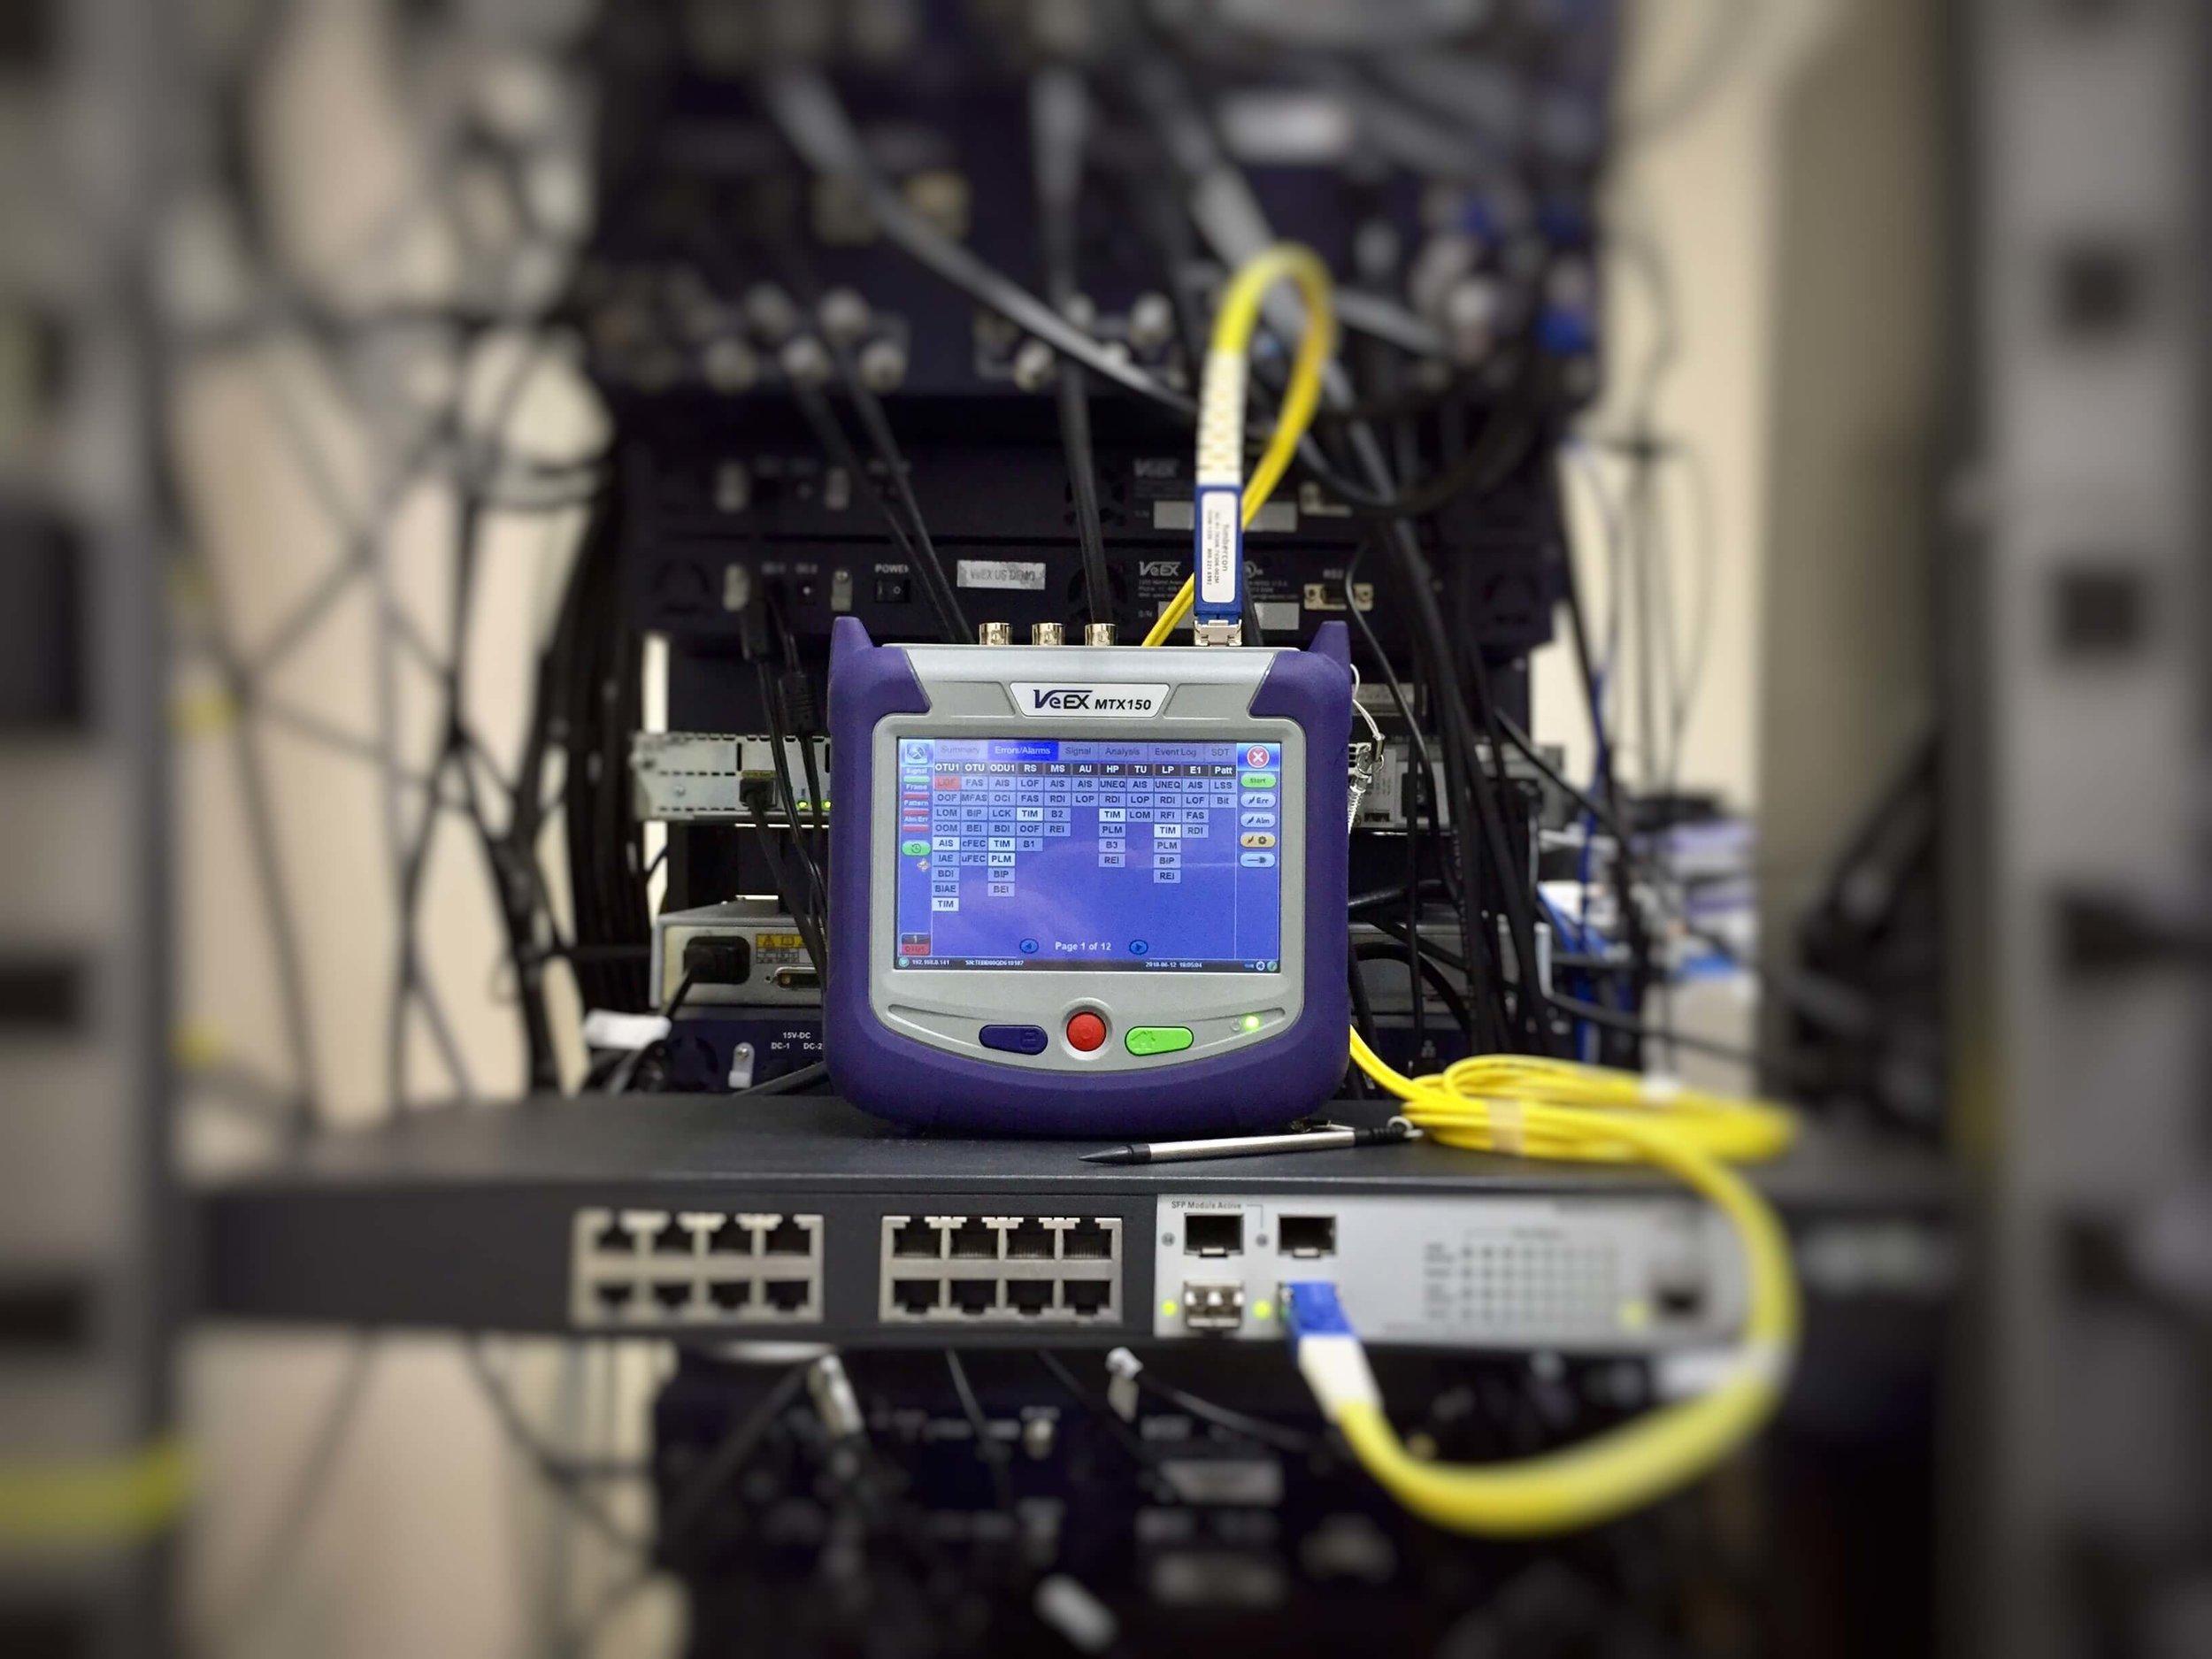 Controls - Wireless SolutionsWired SolutionsScreensUI/UXSoftware